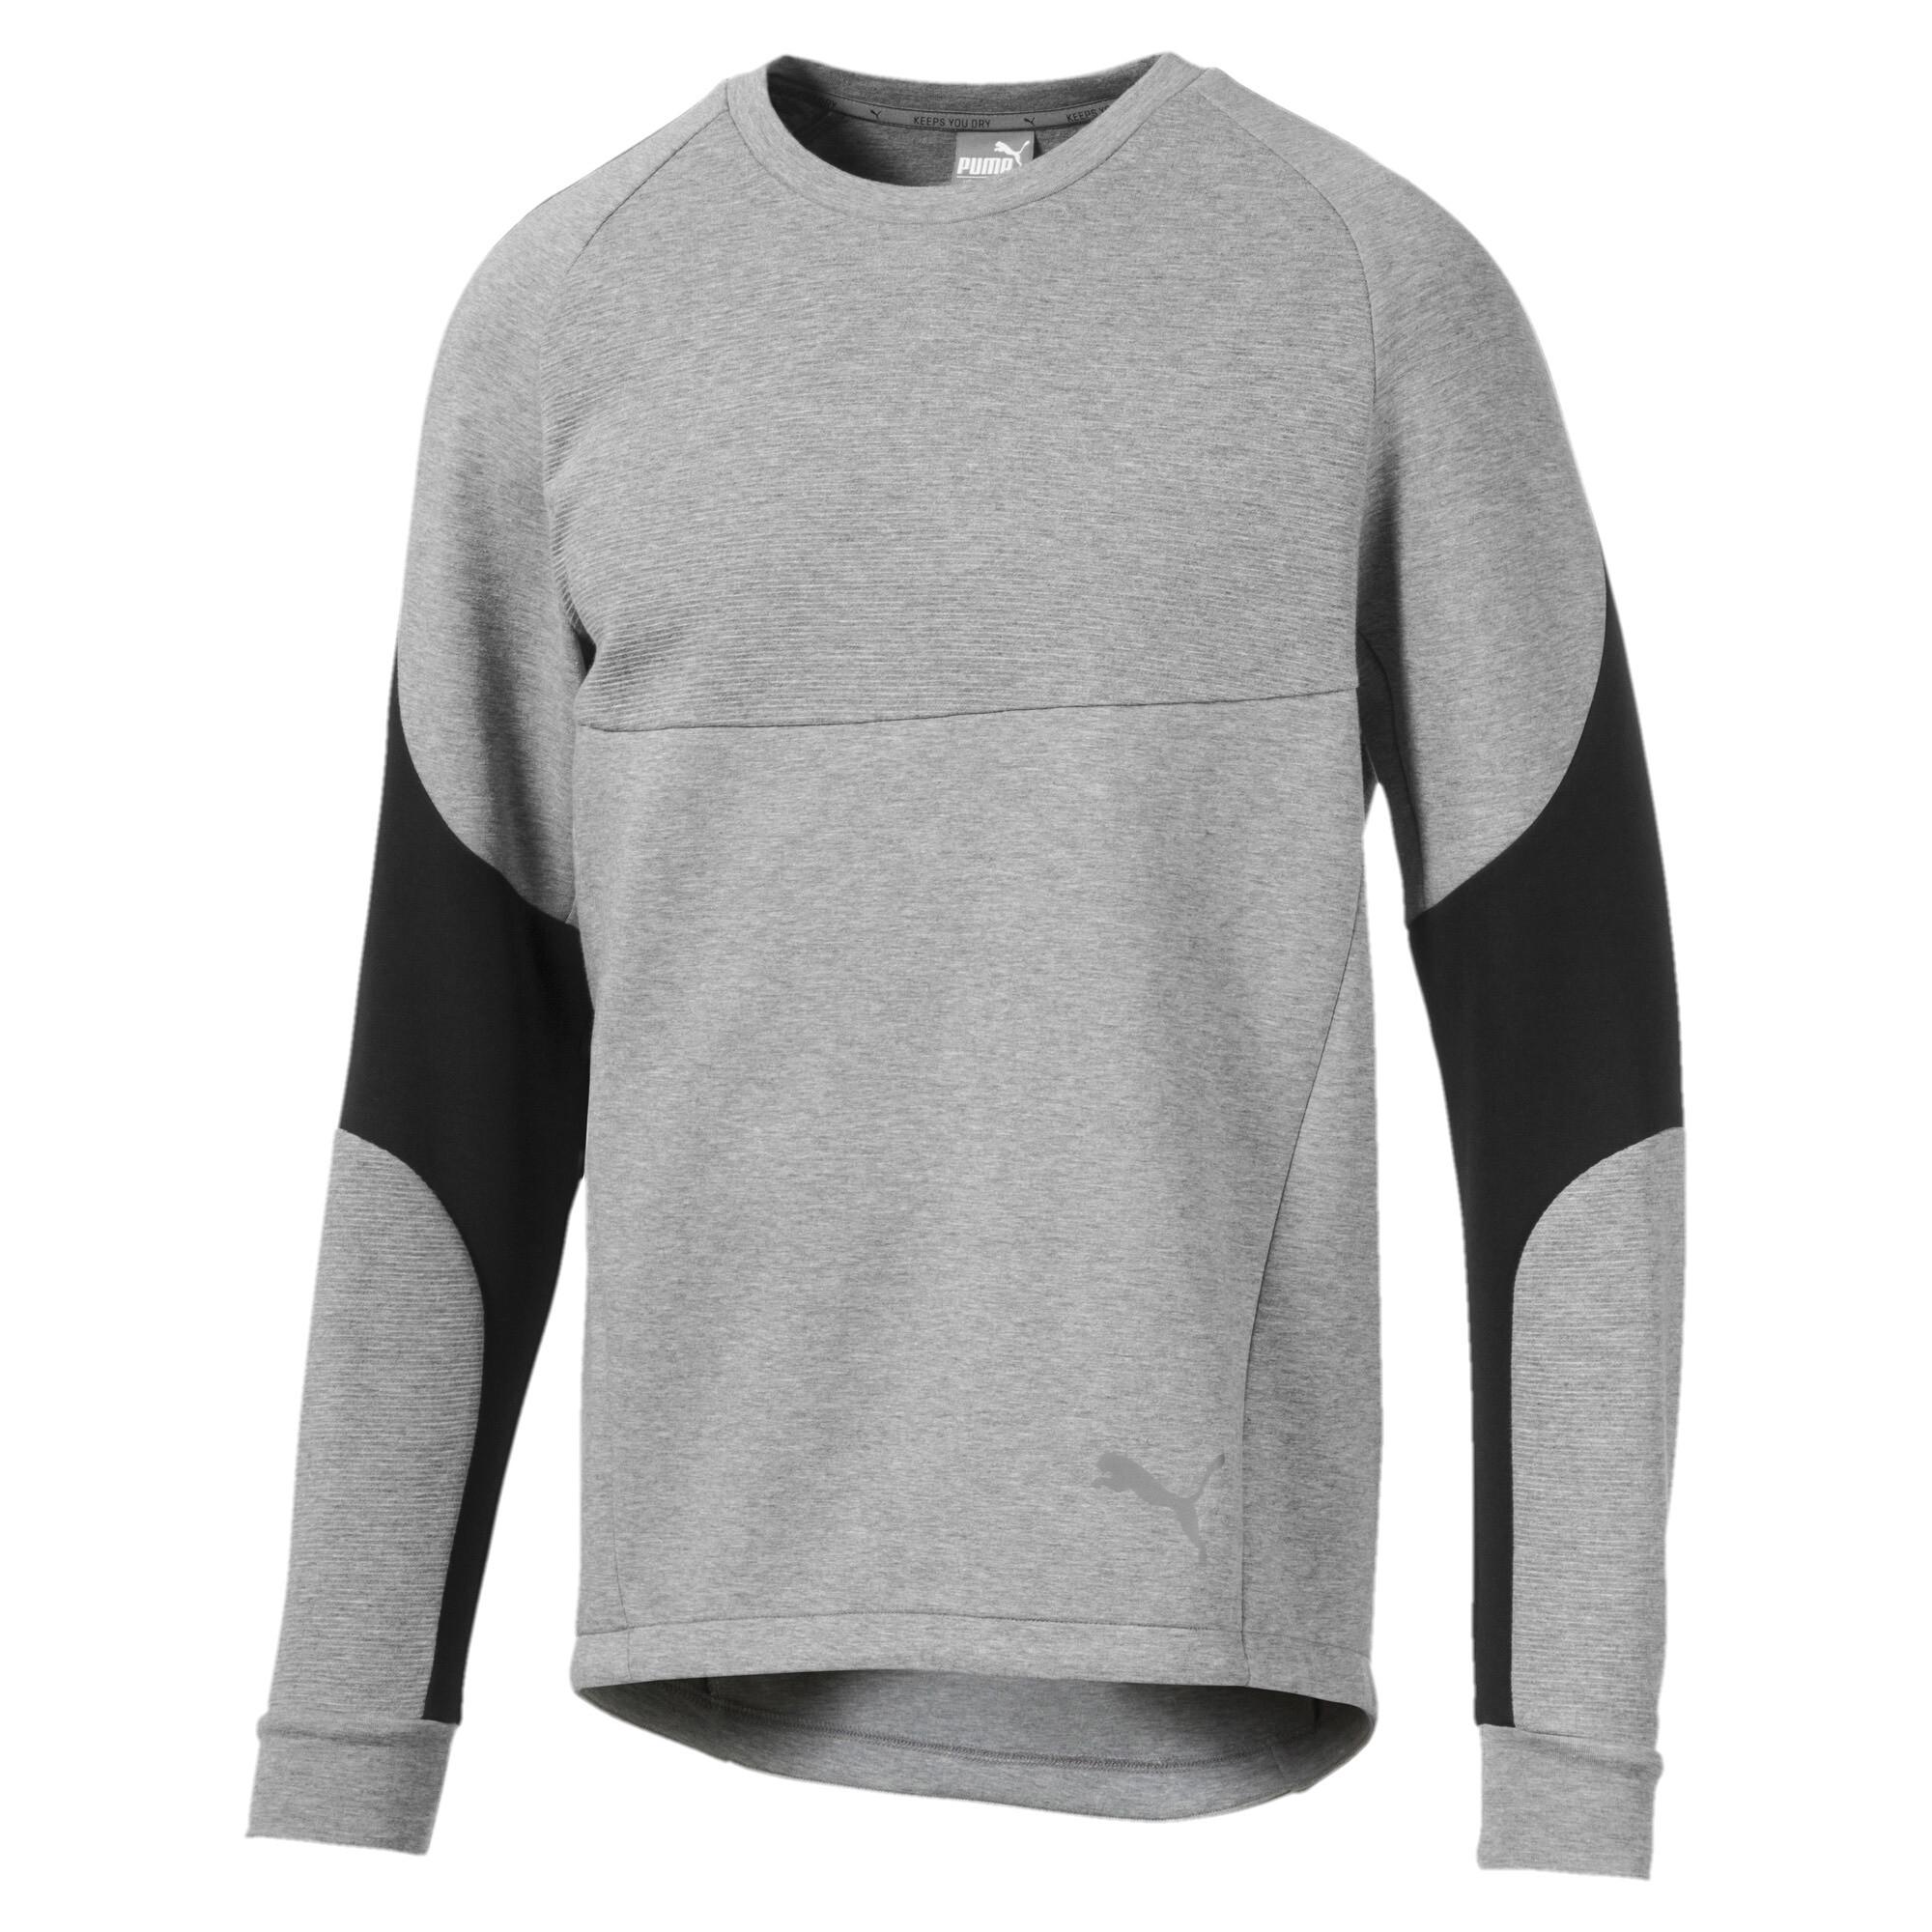 032d9a4bbbd Evostripe Crew Men's Sweater